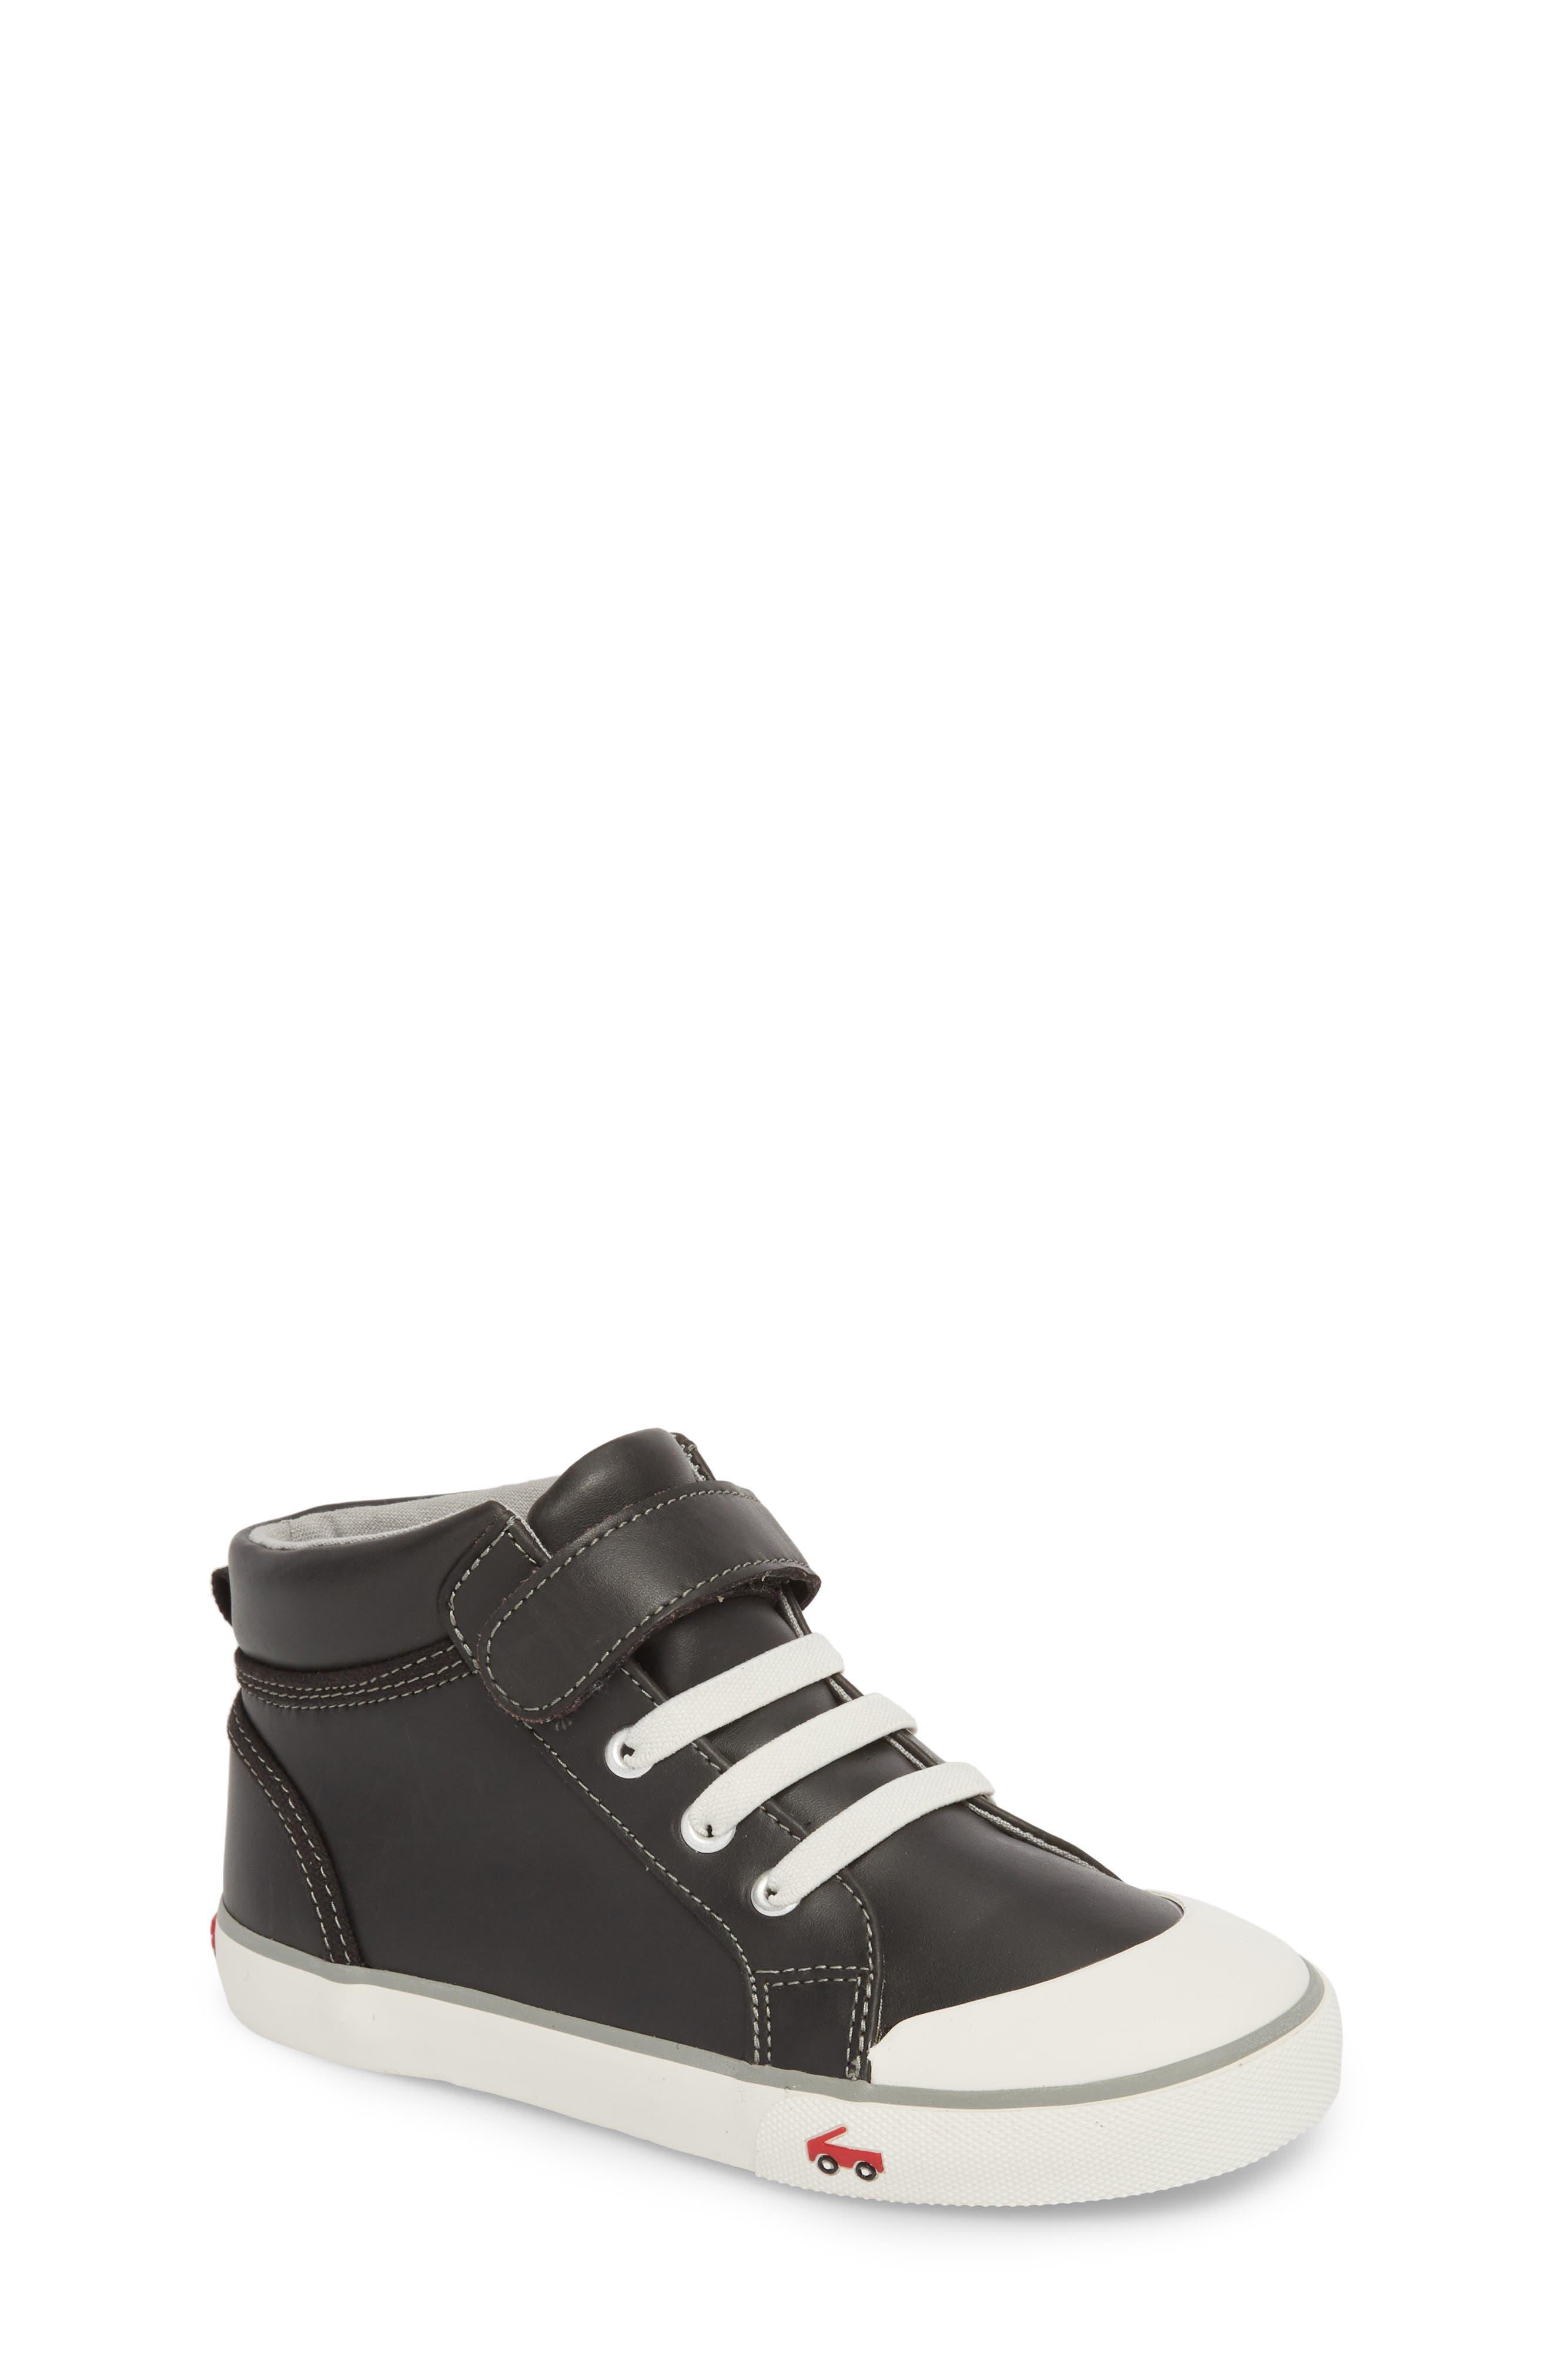 Peyton Metallic Mid Top Sneaker,                         Main,                         color, Black Leather